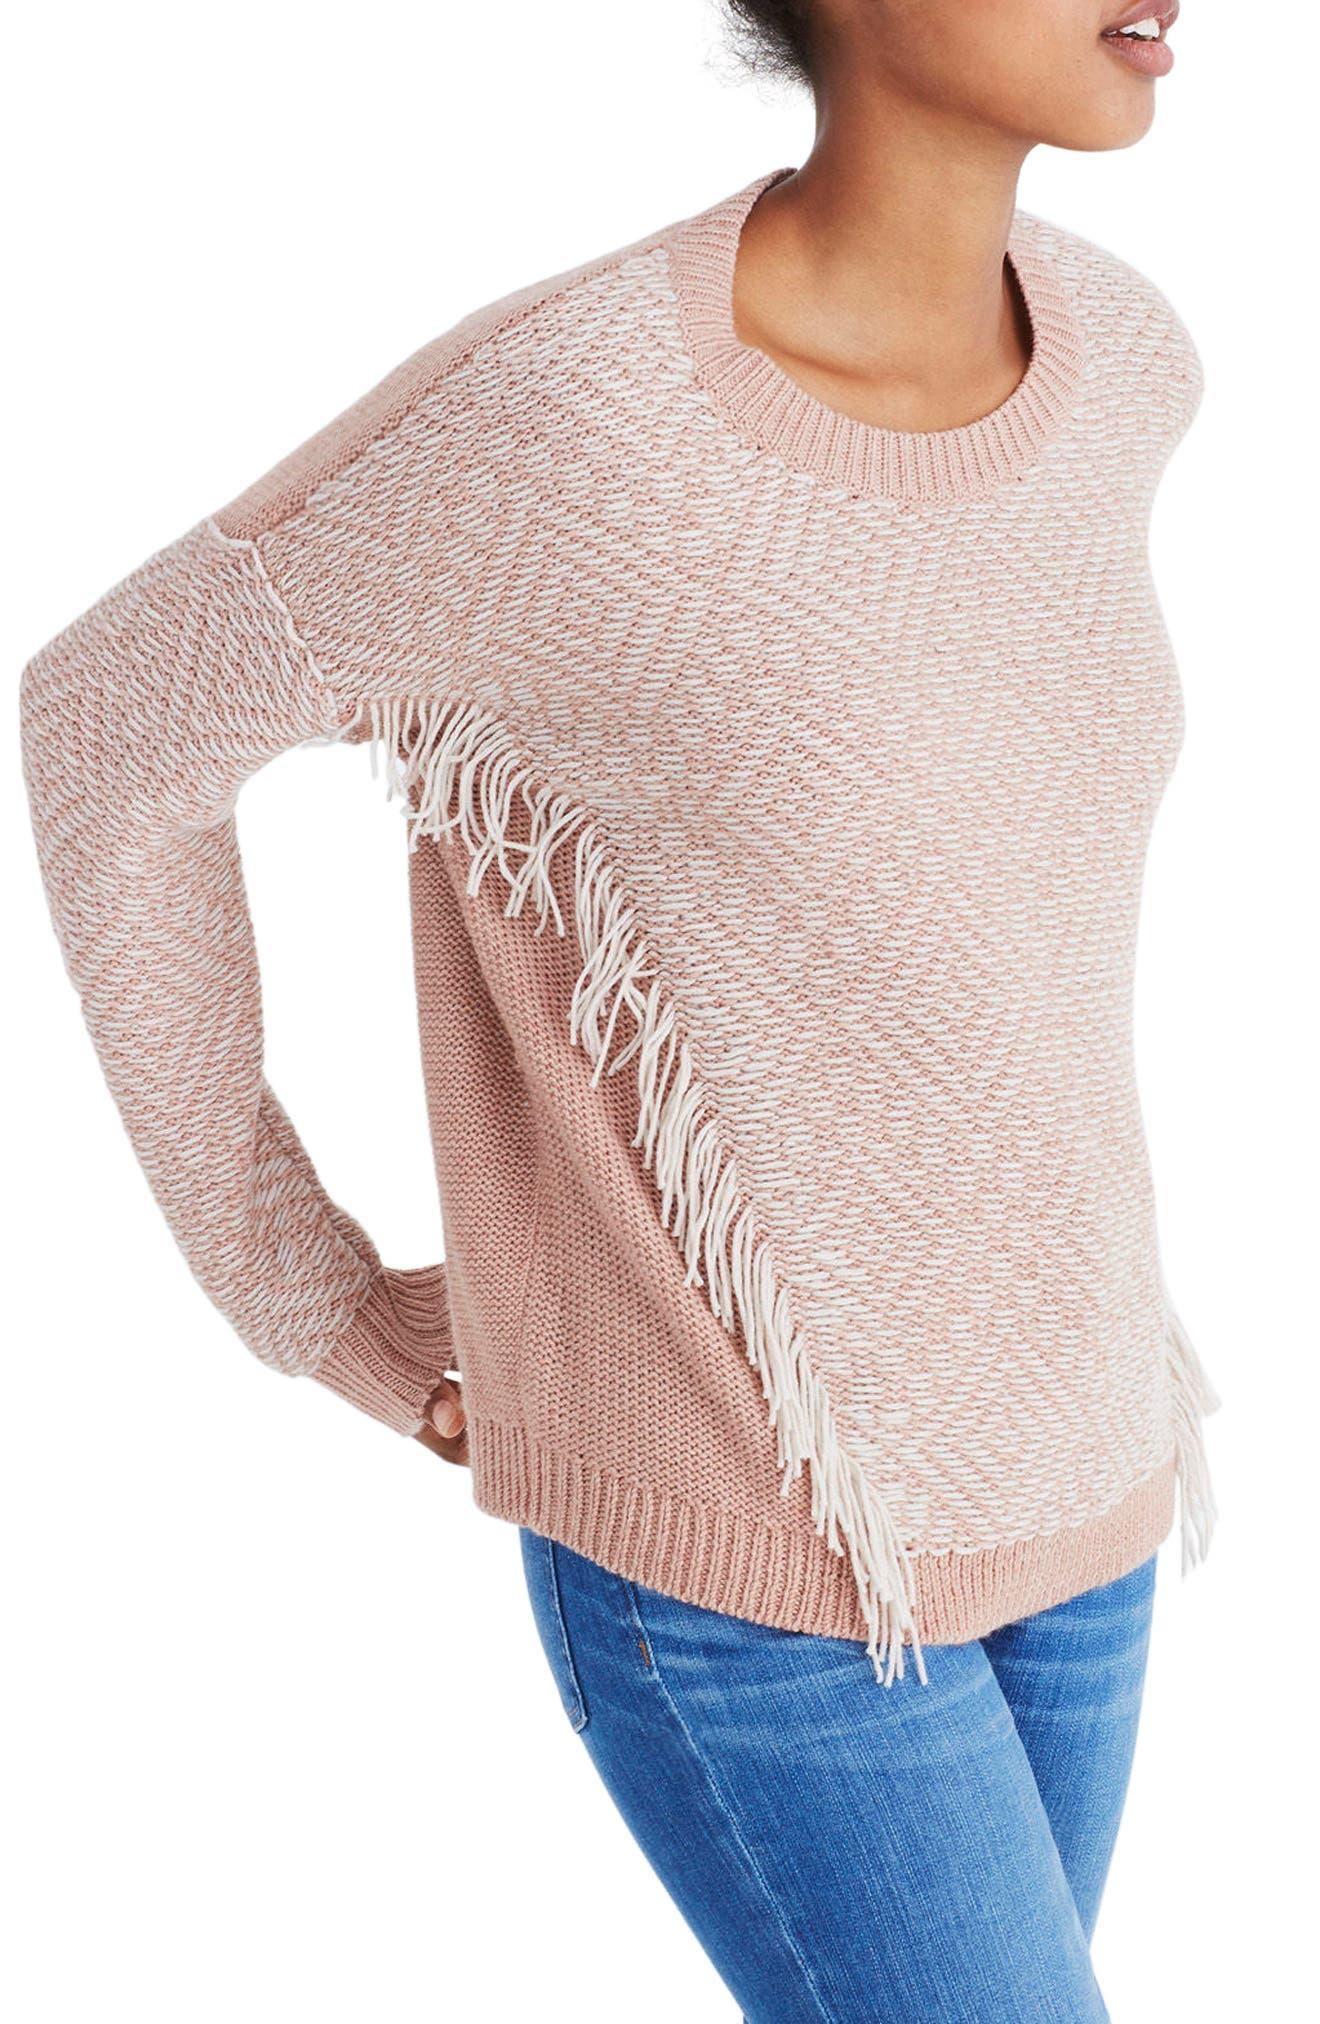 Main Image - Madewell Reverse Diamond Pullover Sweater